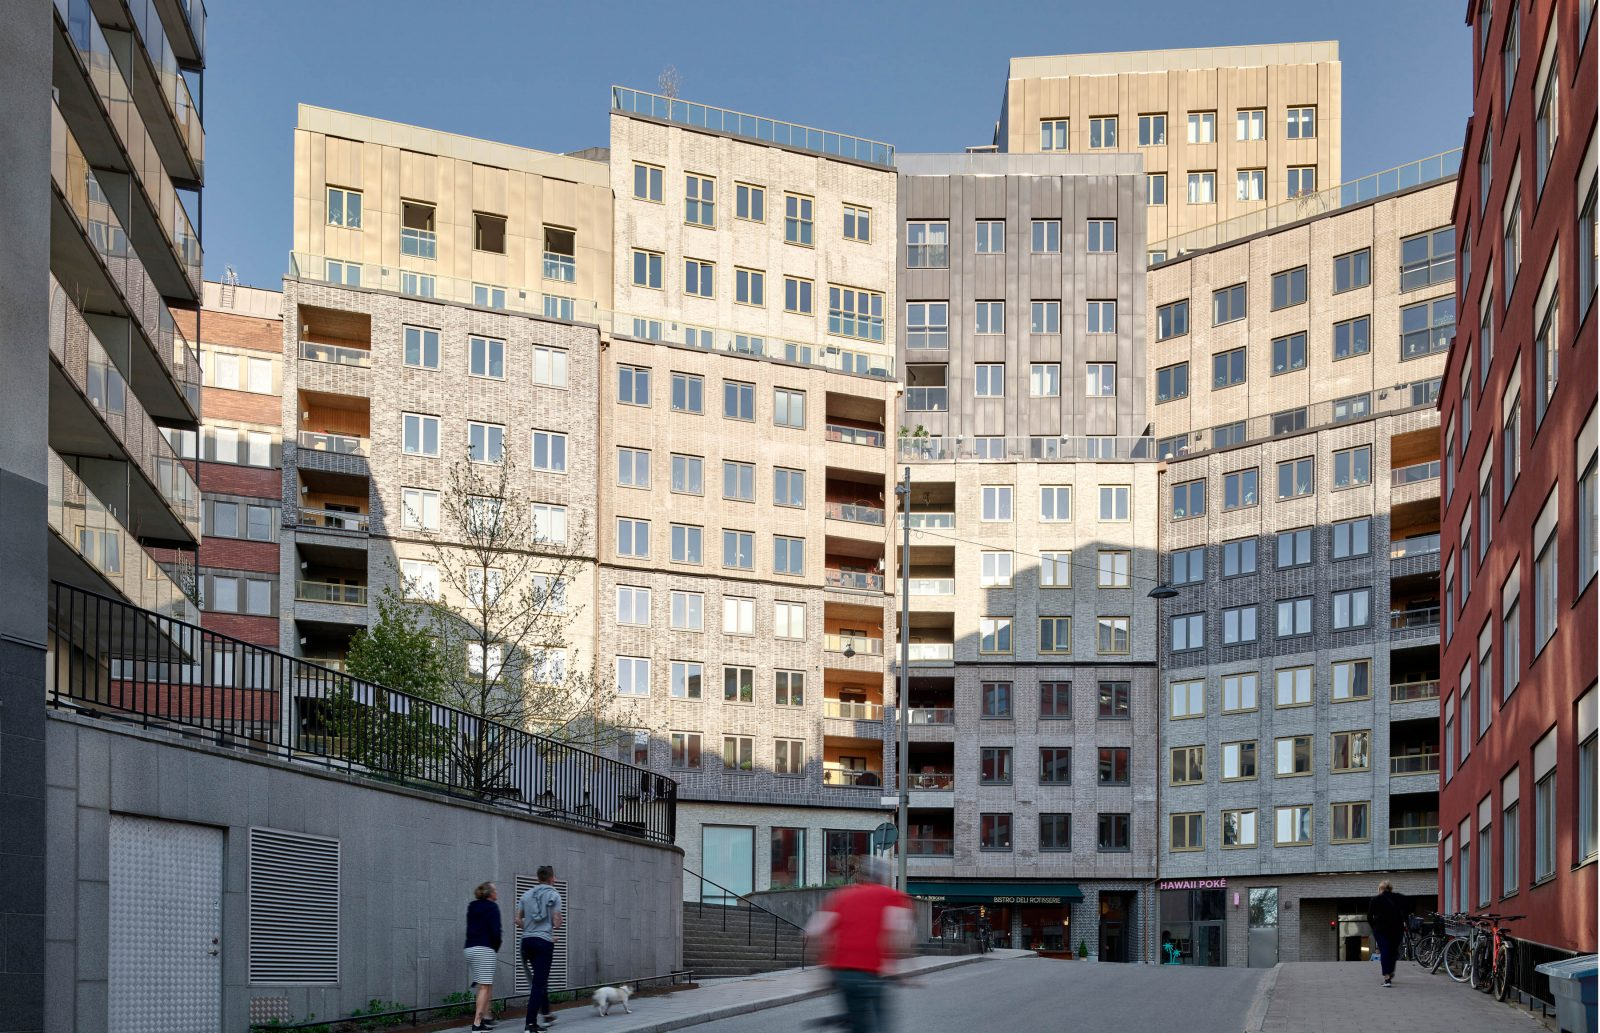 KjellanderSjoberg Etaget main-view 3600x2324